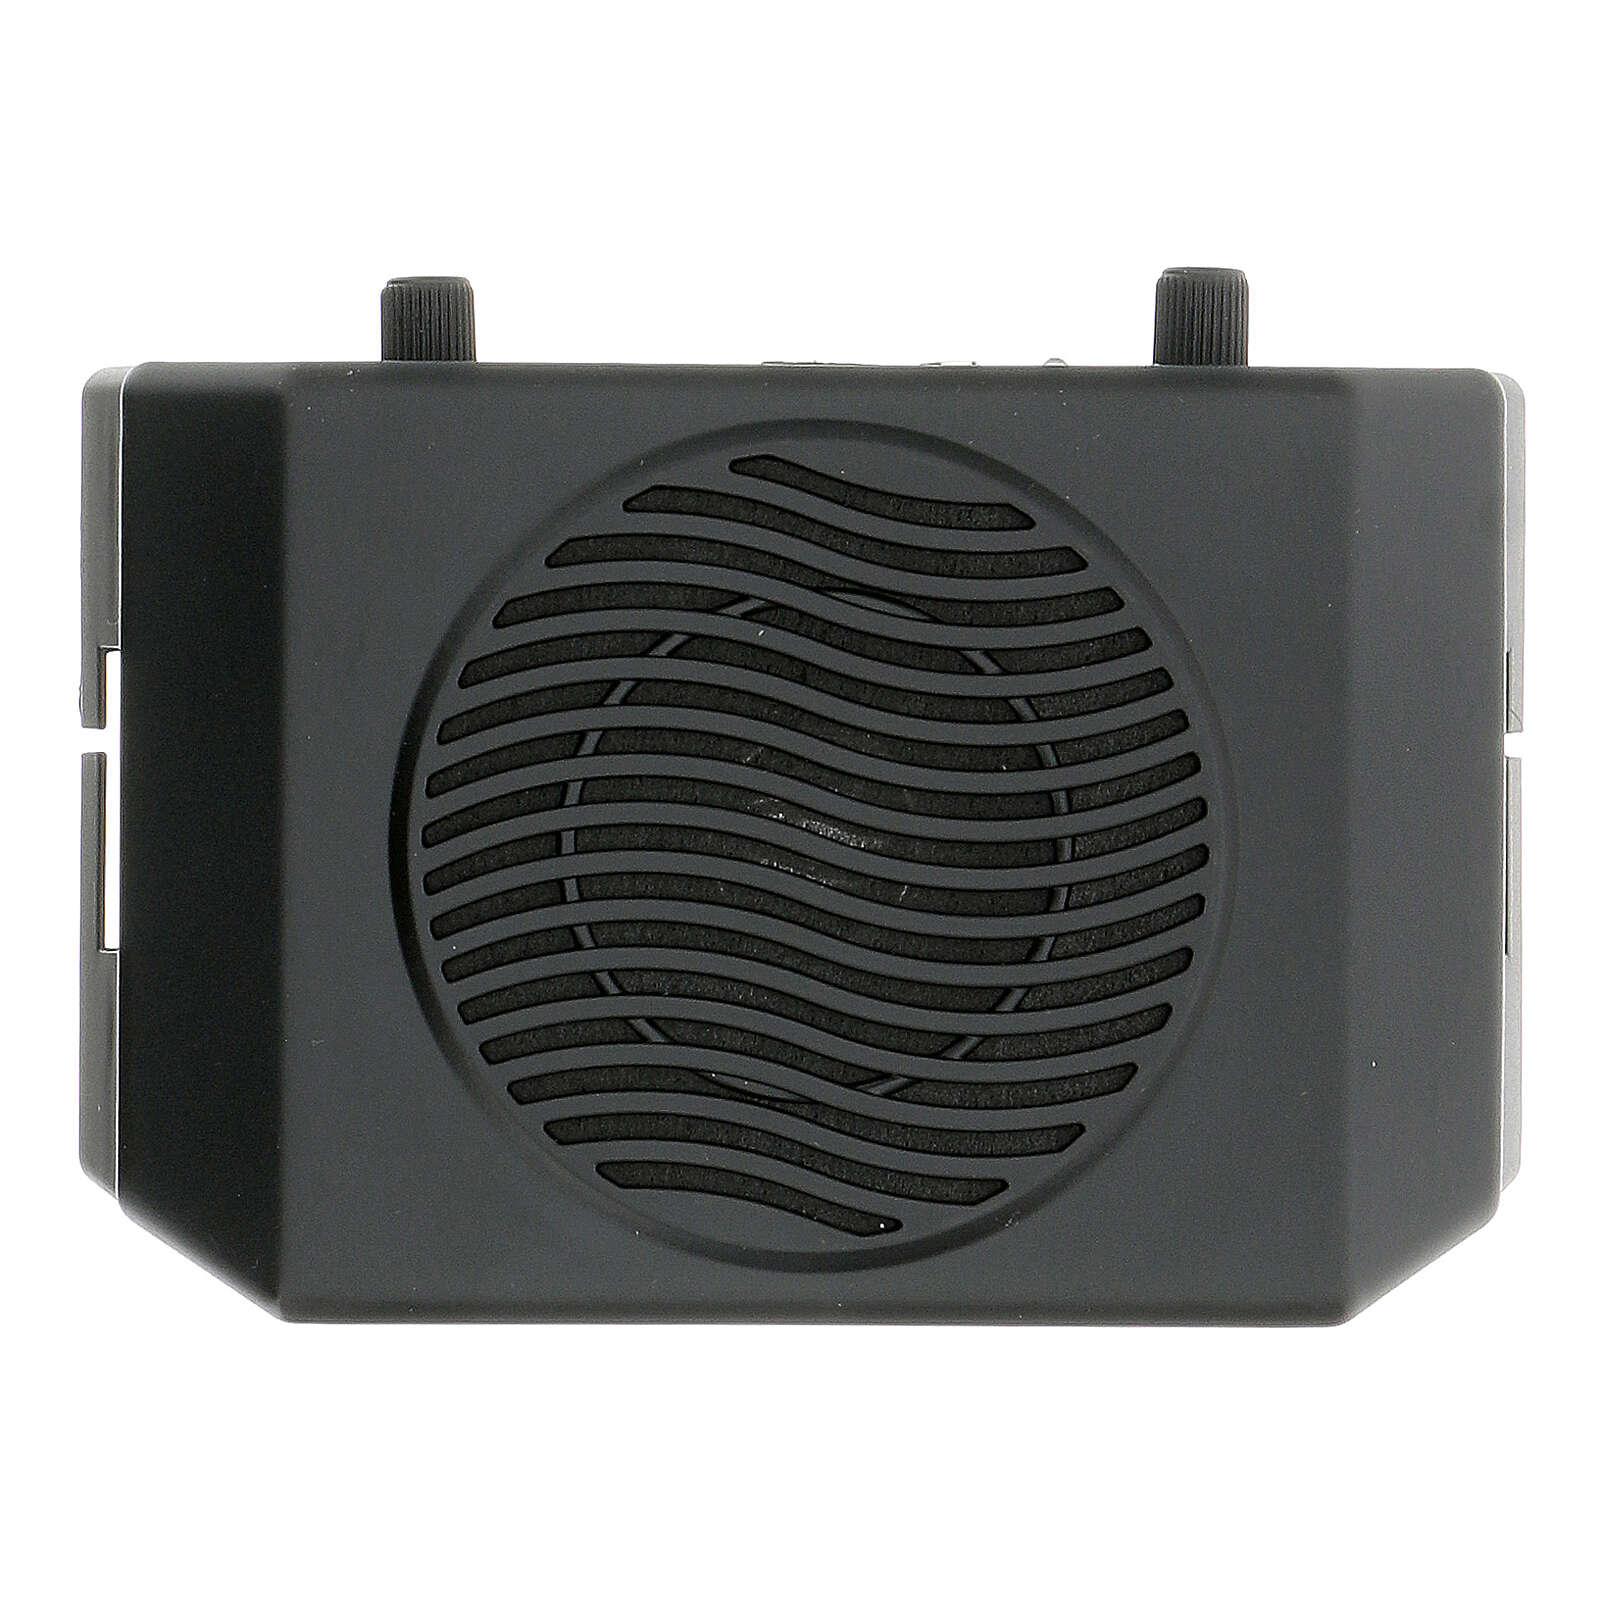 Amplificador portátil para celebración 3